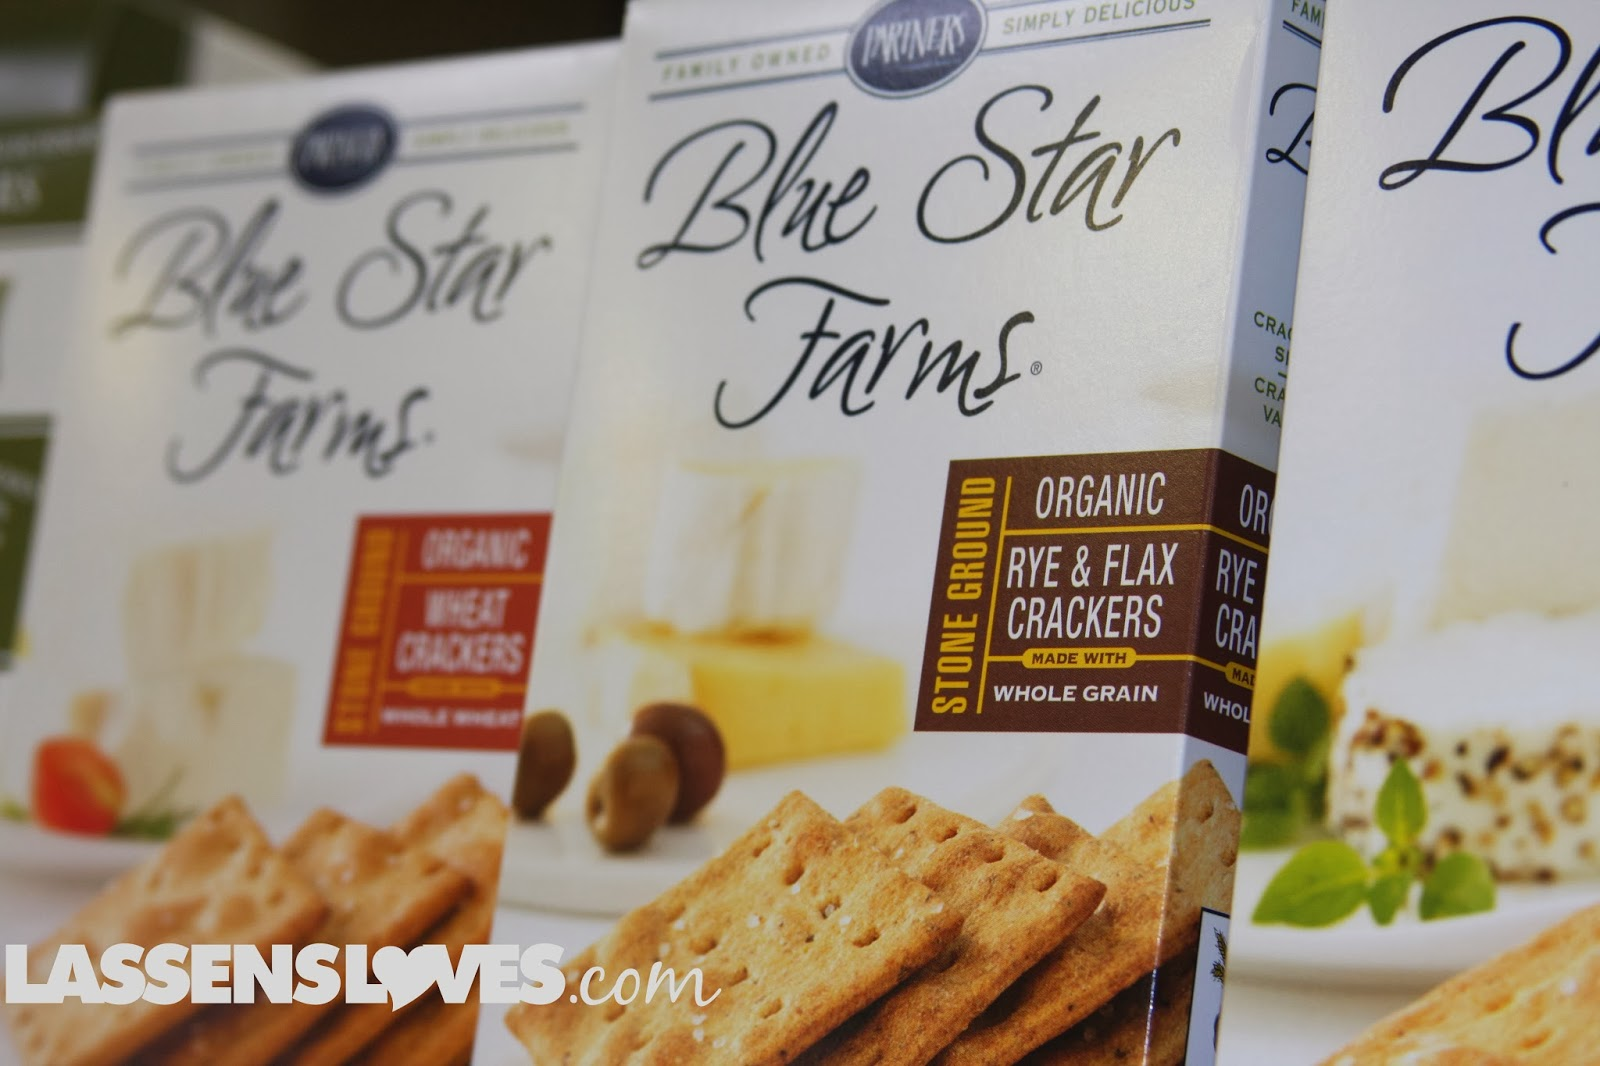 Blue+Star+Farms+Crackers, Blue+Star+Farms, Blue+Star